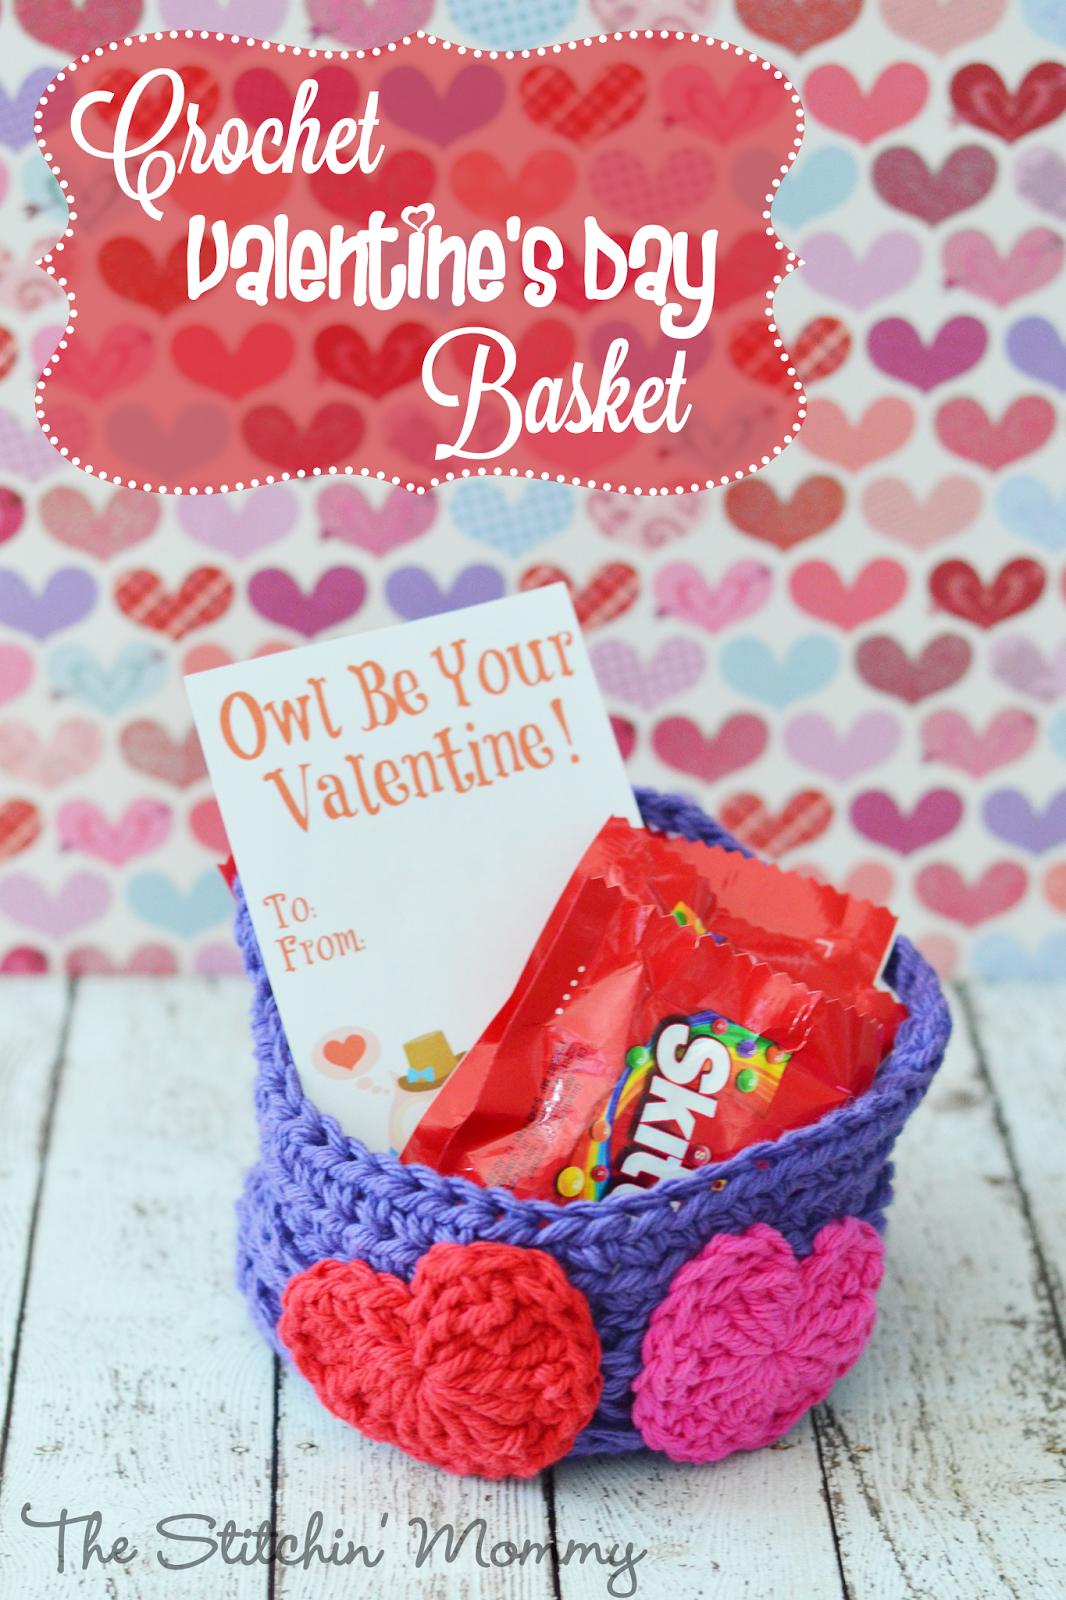 Easy Crochet Valentine's Day Basket by The Stitchin' Mommy